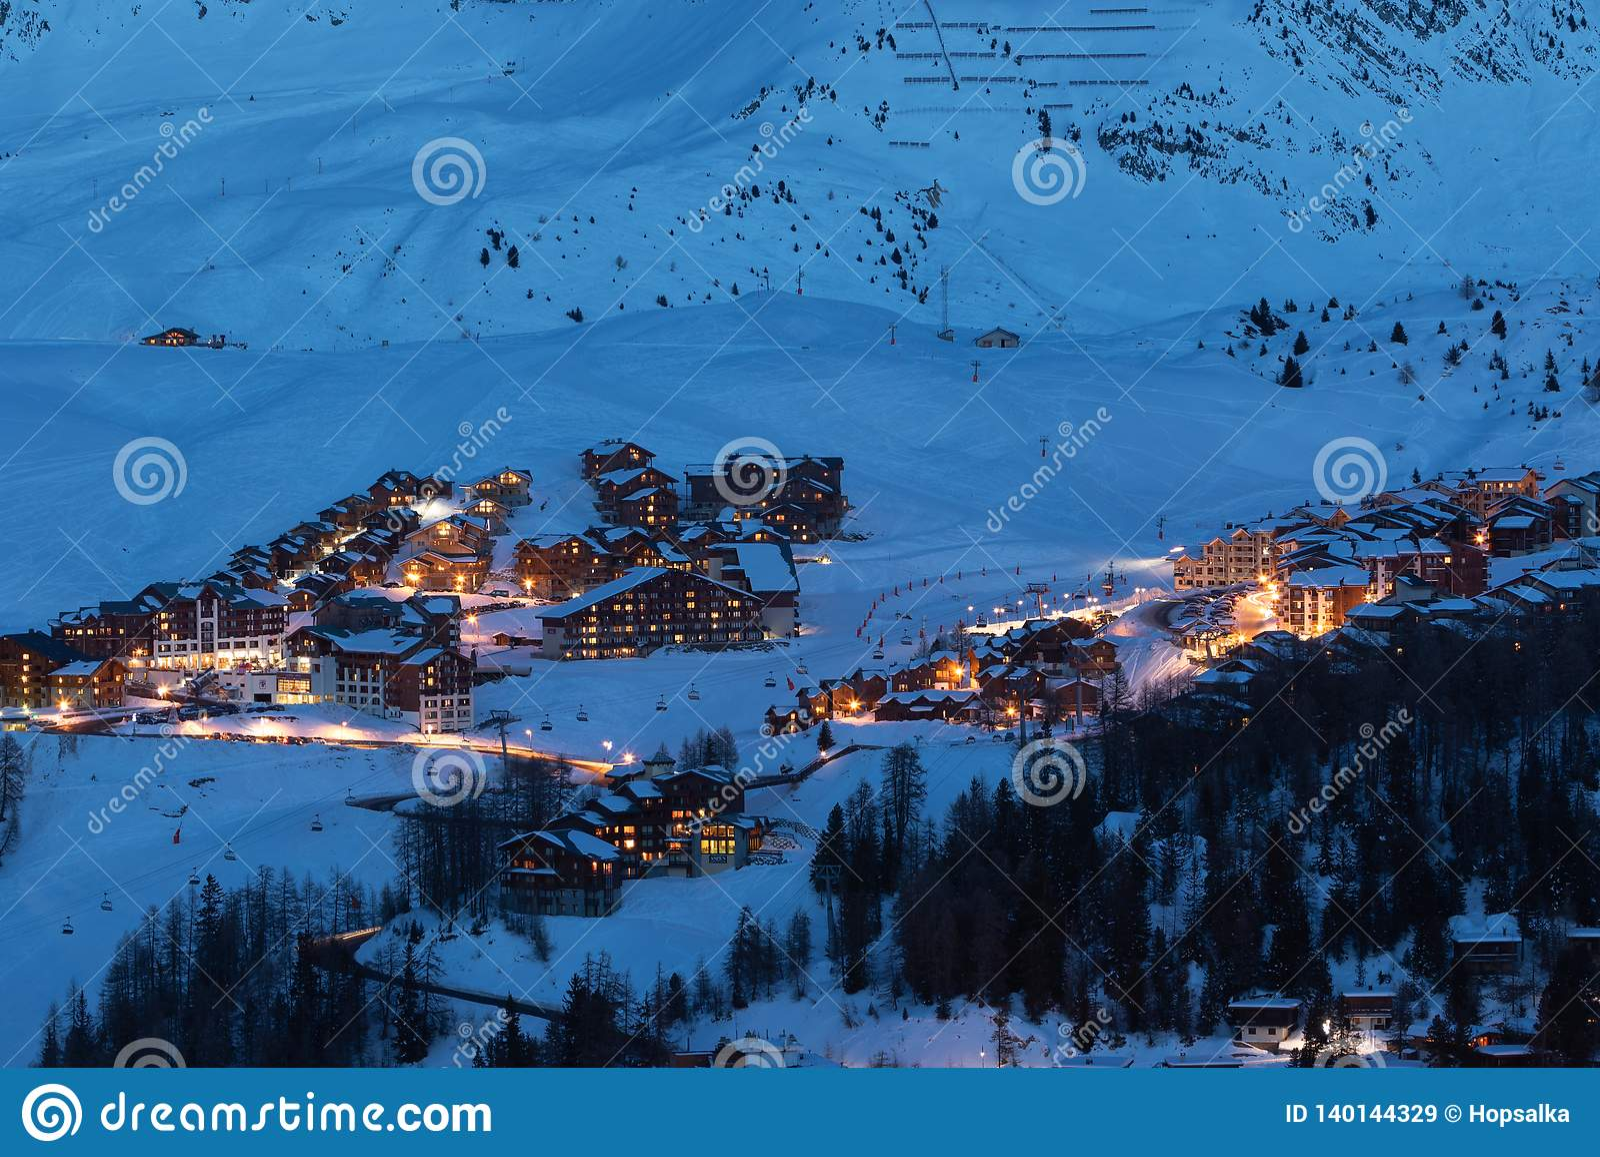 View of high altitude ski resorts in French Savoy Alps in twilight: Plagne Centre, Plagne Soleil and Plagne Village